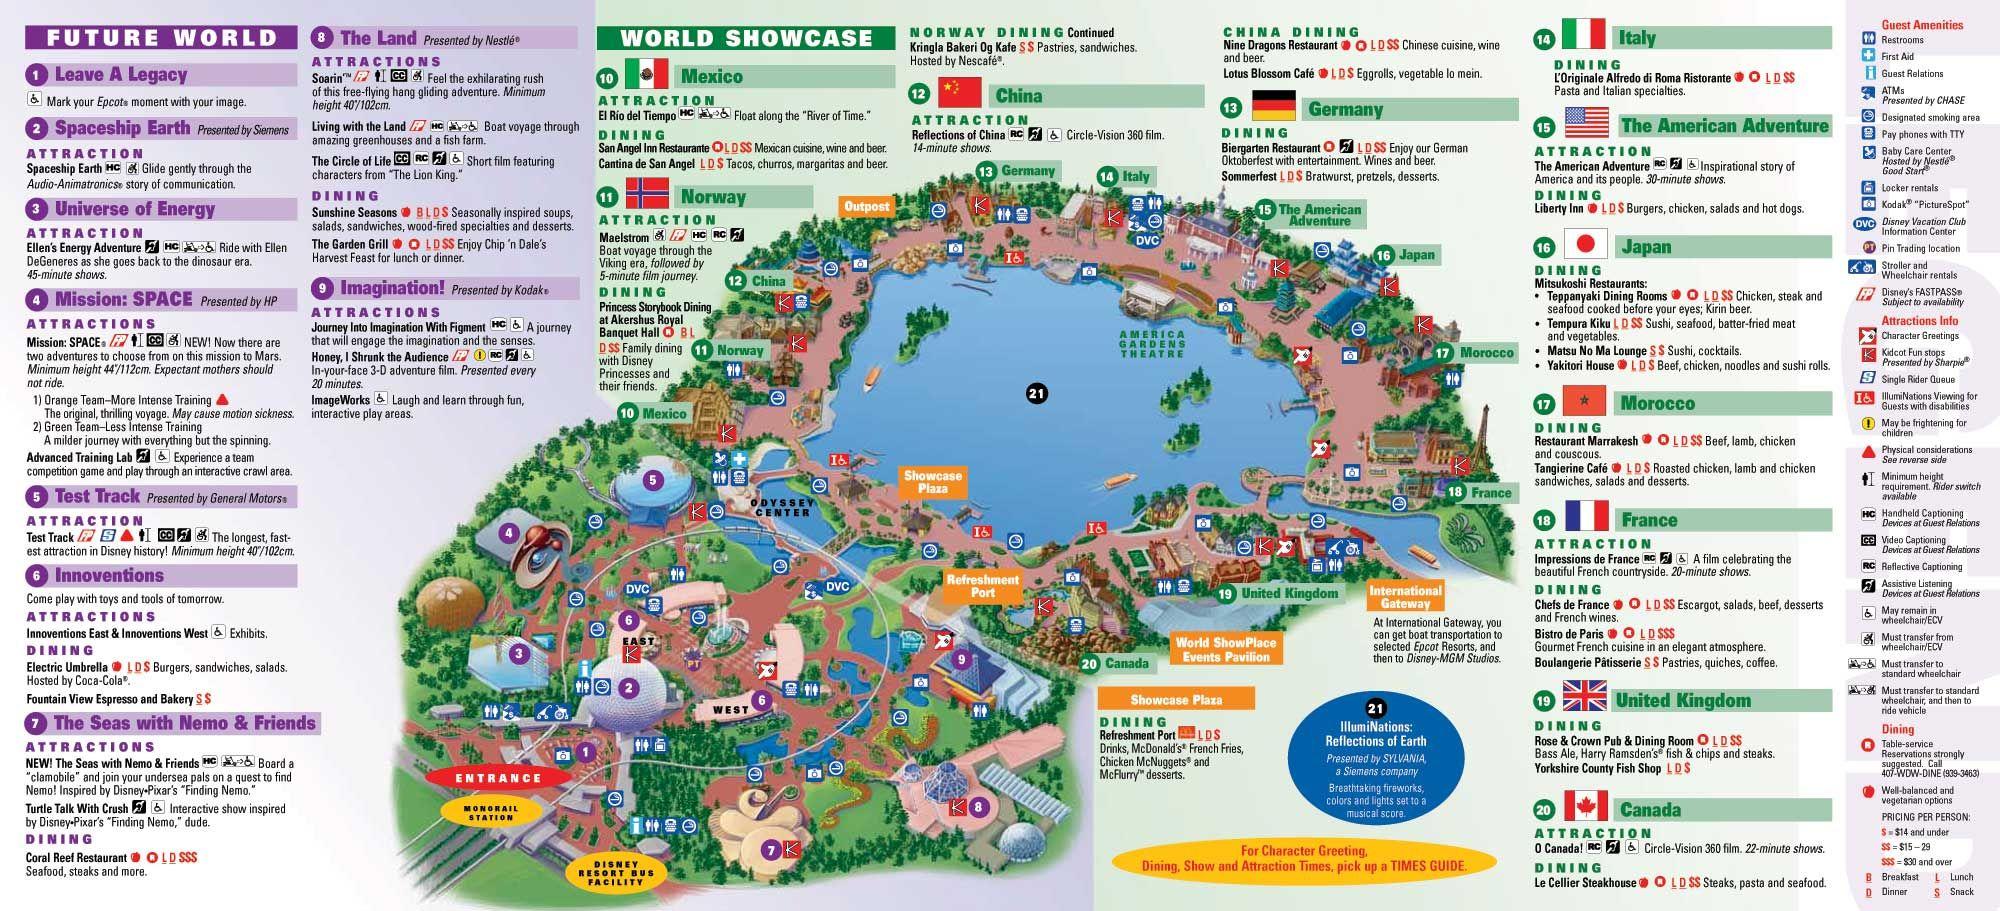 Epcot Disney World Map Epcot | Epcot map, Disney world map, Disney world epcot map